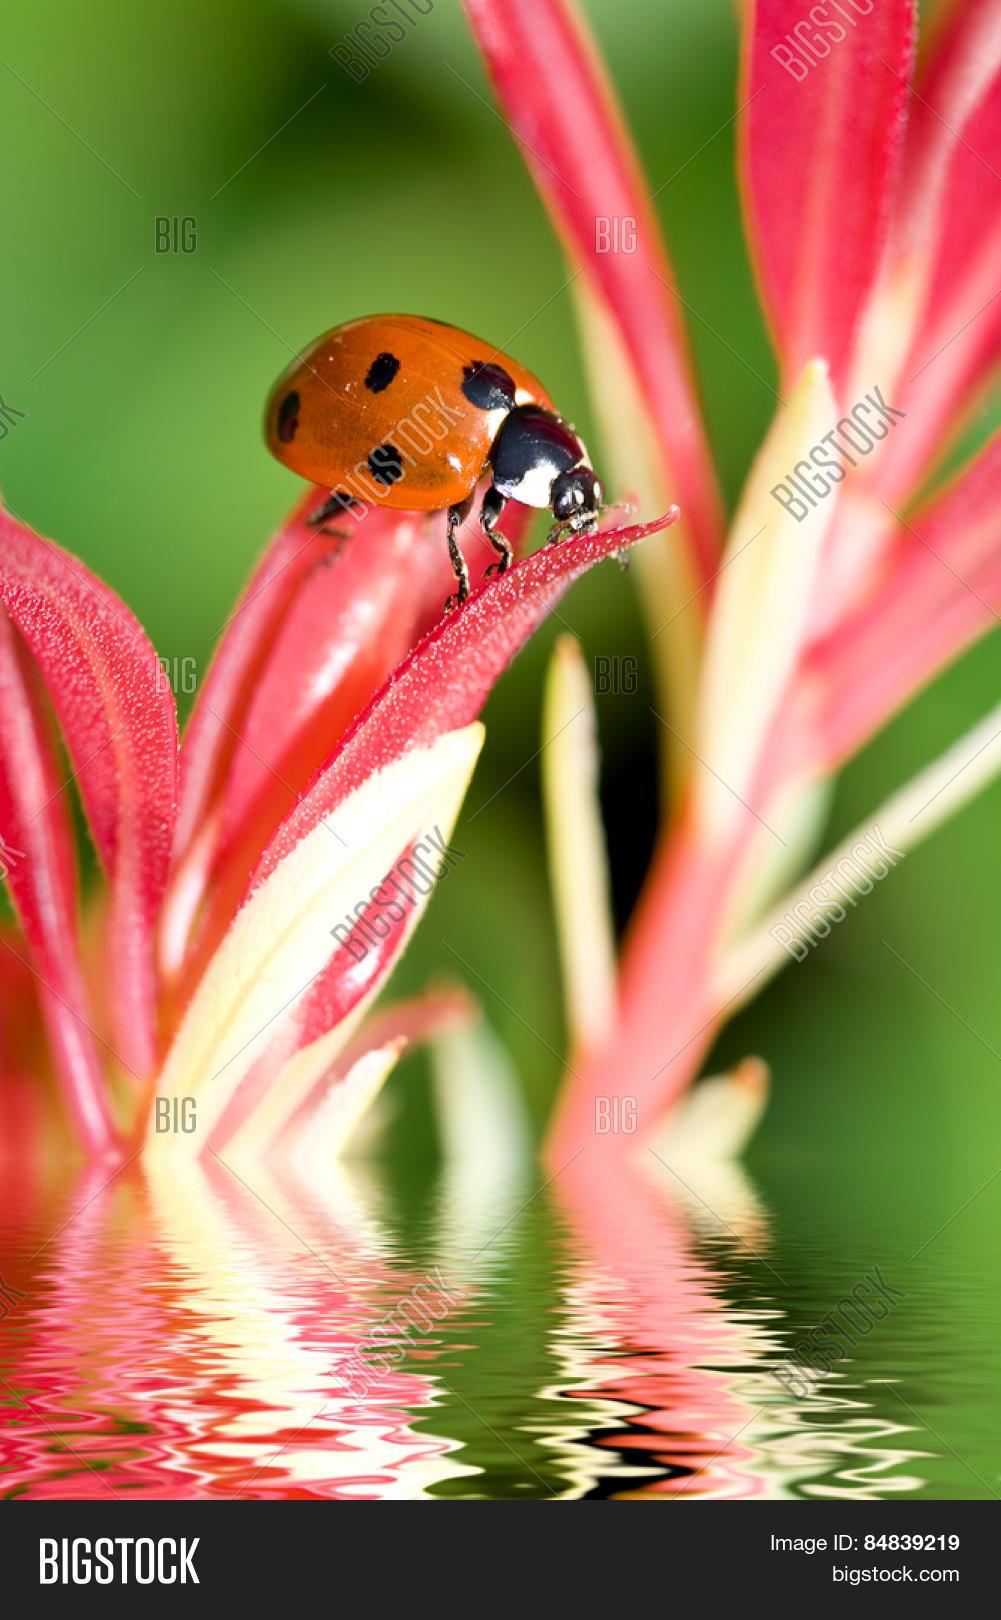 Ladybug On A Flower : ladybug, flower, Ladybug, Flower, Image, Photo, (Free, Trial), Bigstock